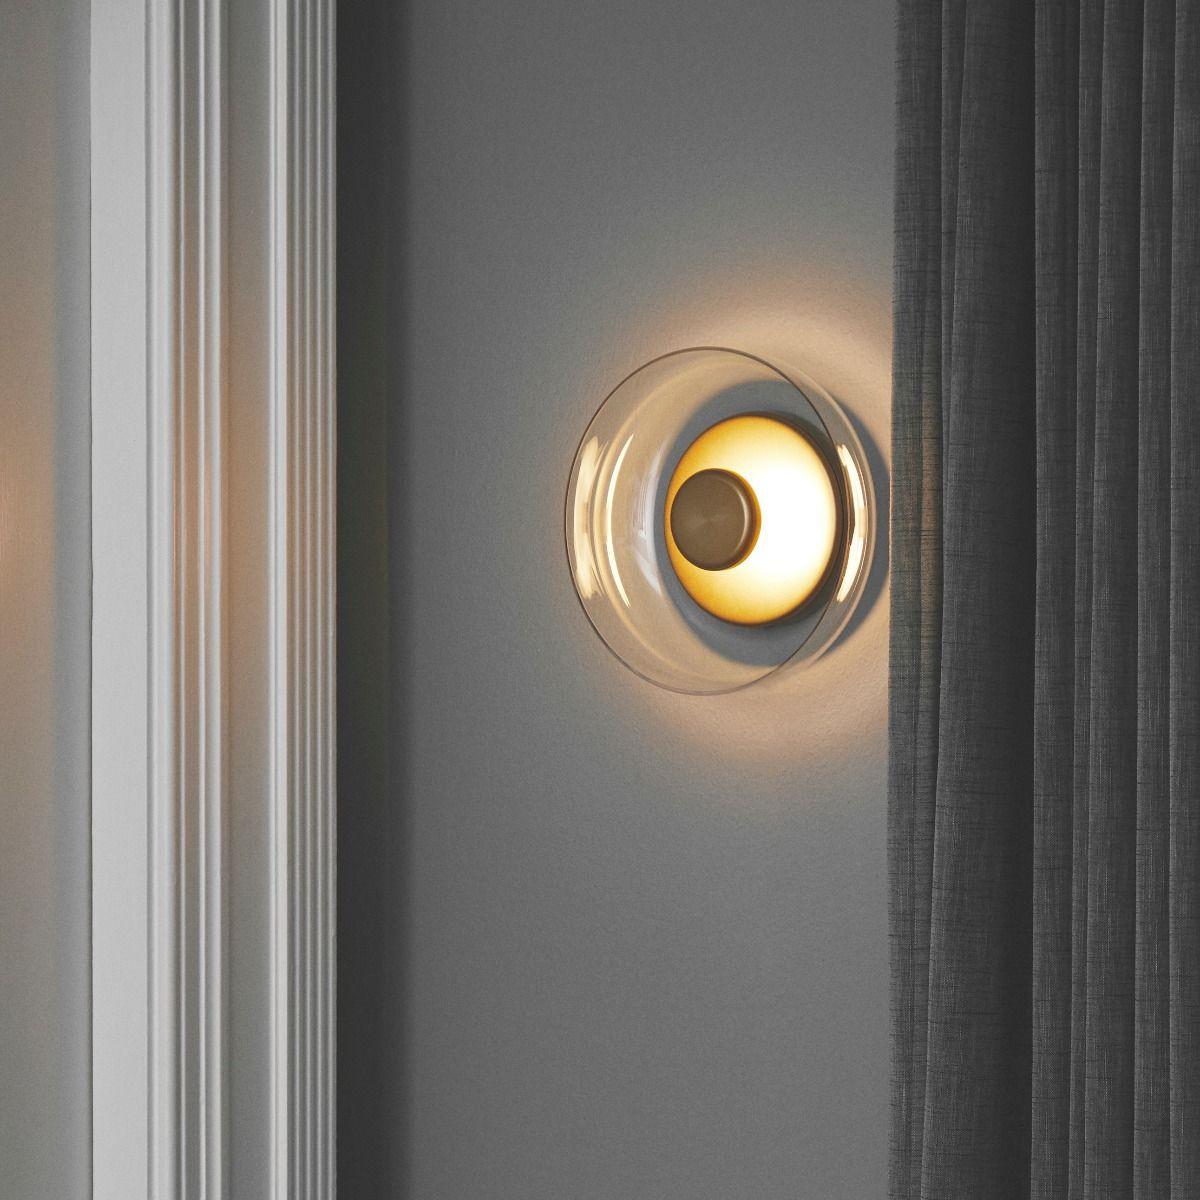 Nuura Blossi Wall light next to window